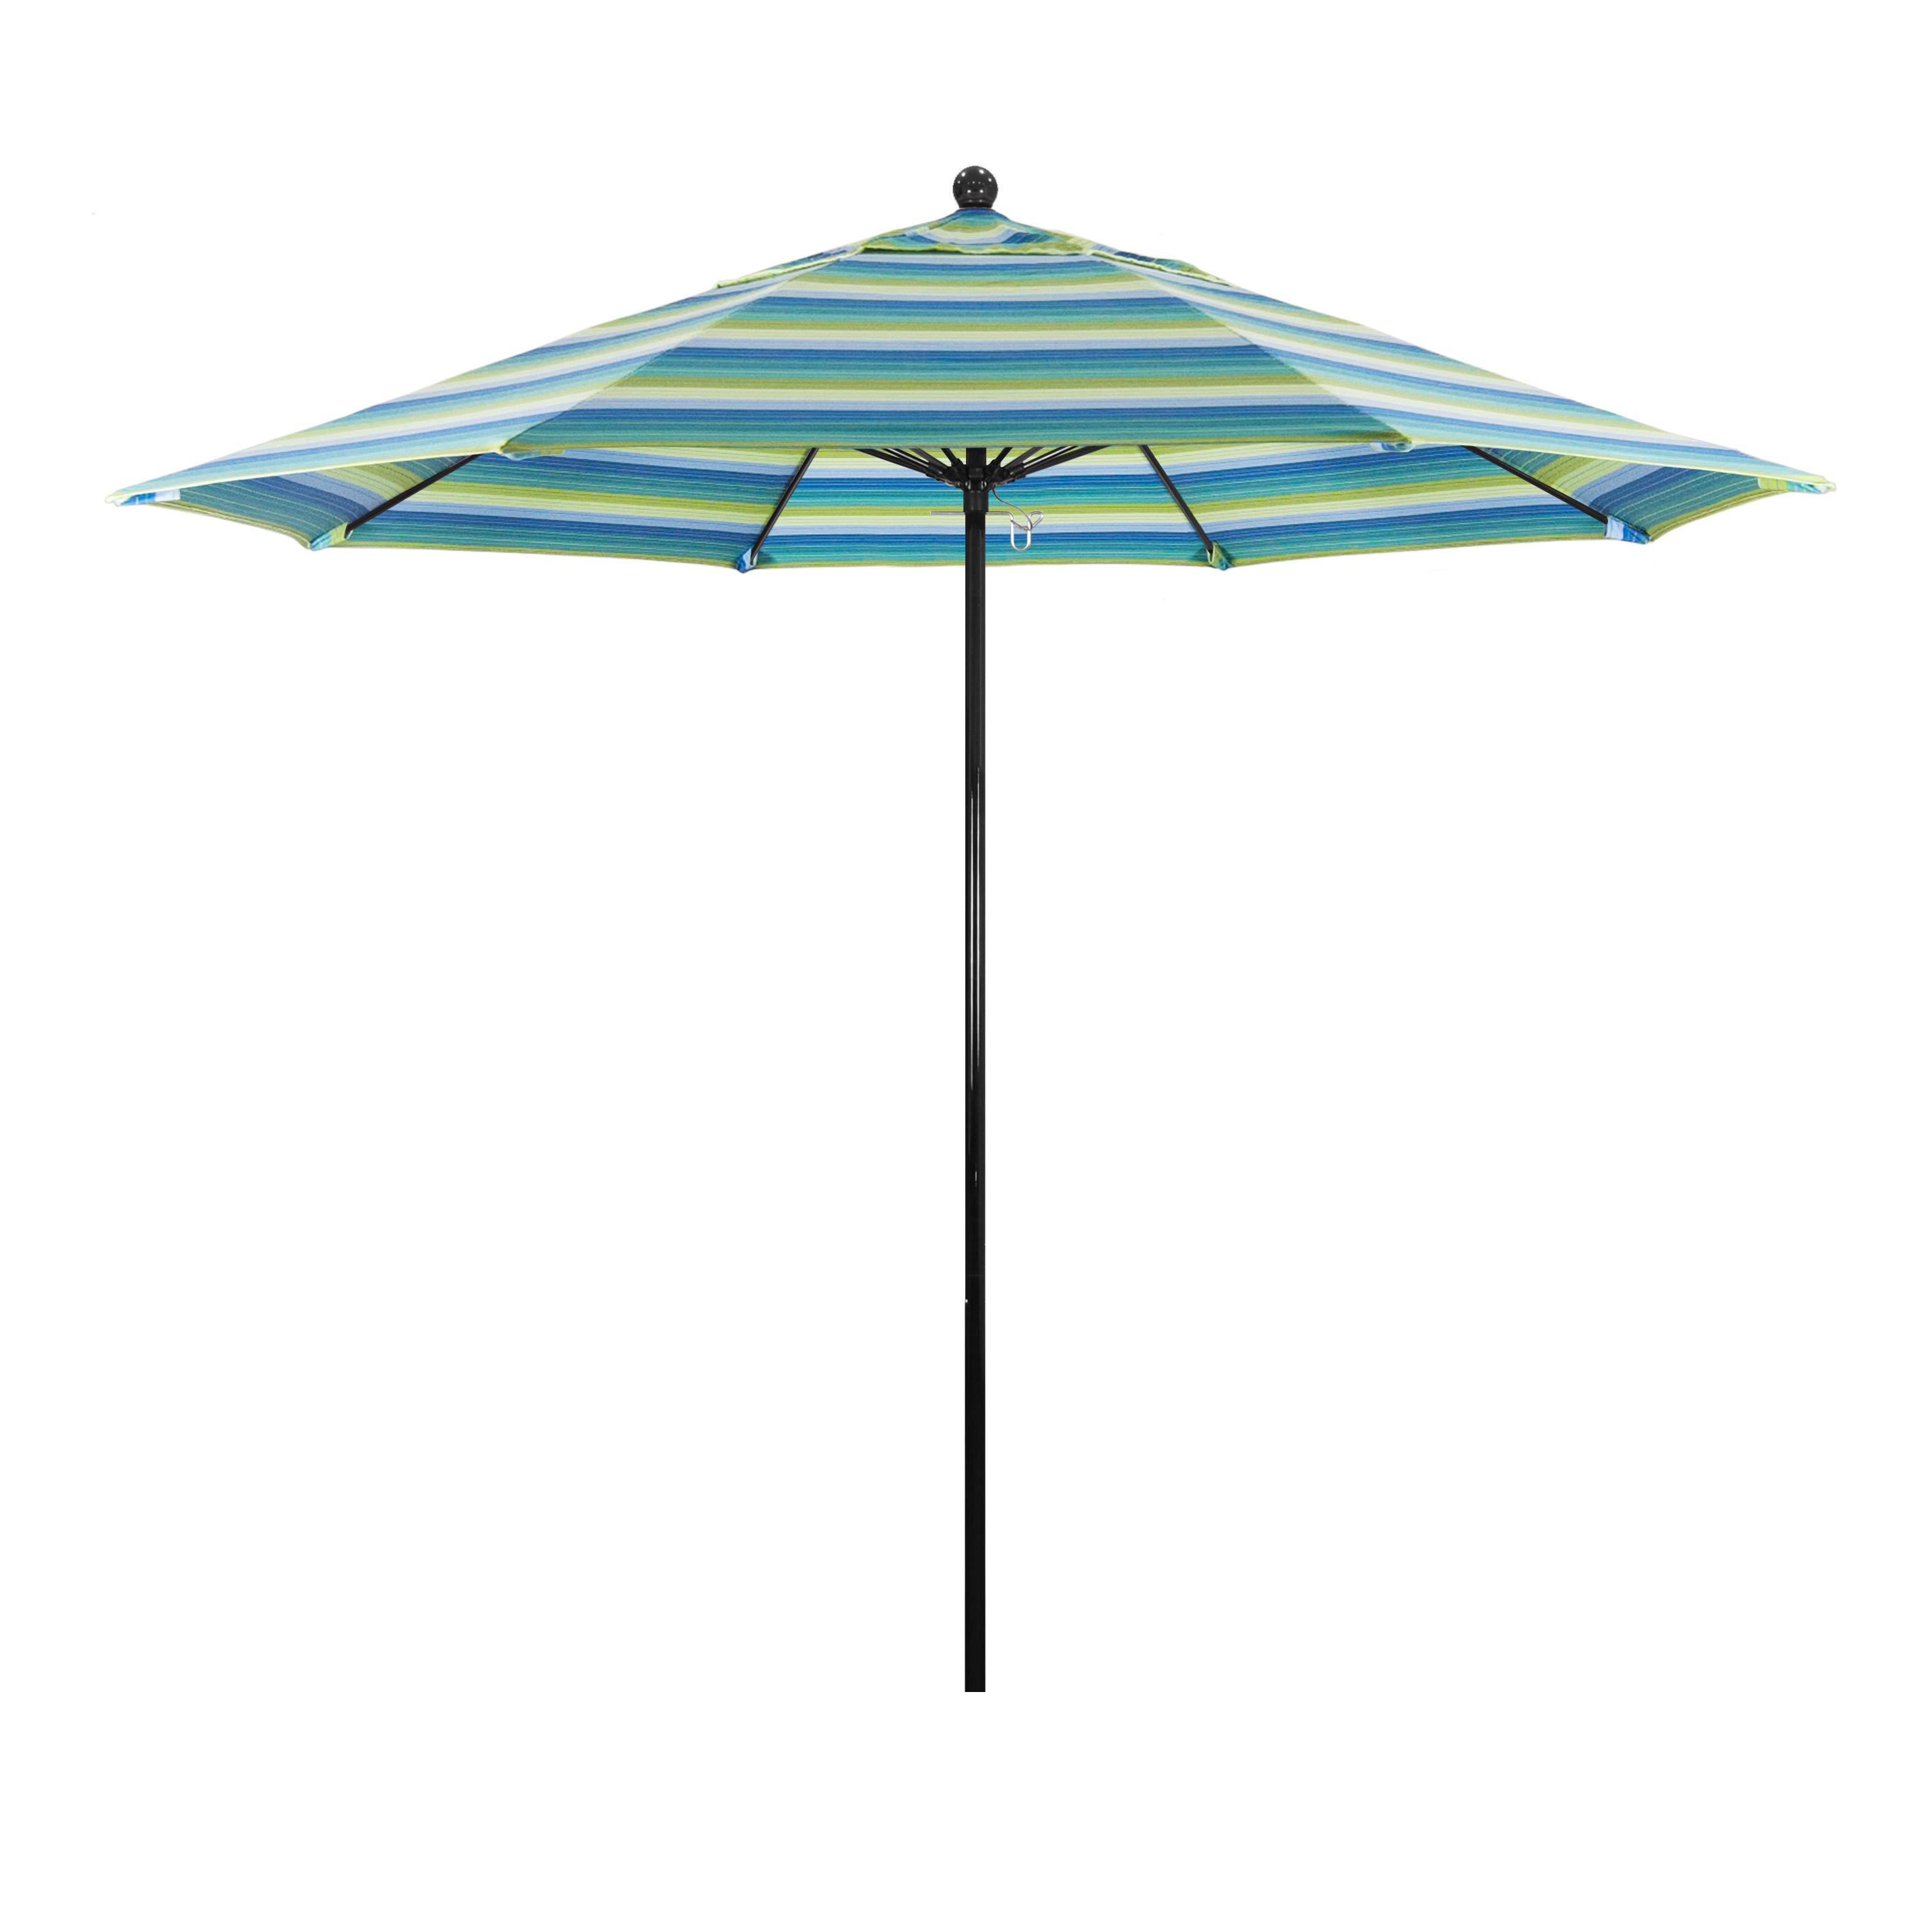 Caravelle Square Market Sunbrella Umbrellas Throughout 2020 Oceanside Series 9' Market Sunbrella Umbrella (Gallery 6 of 20)